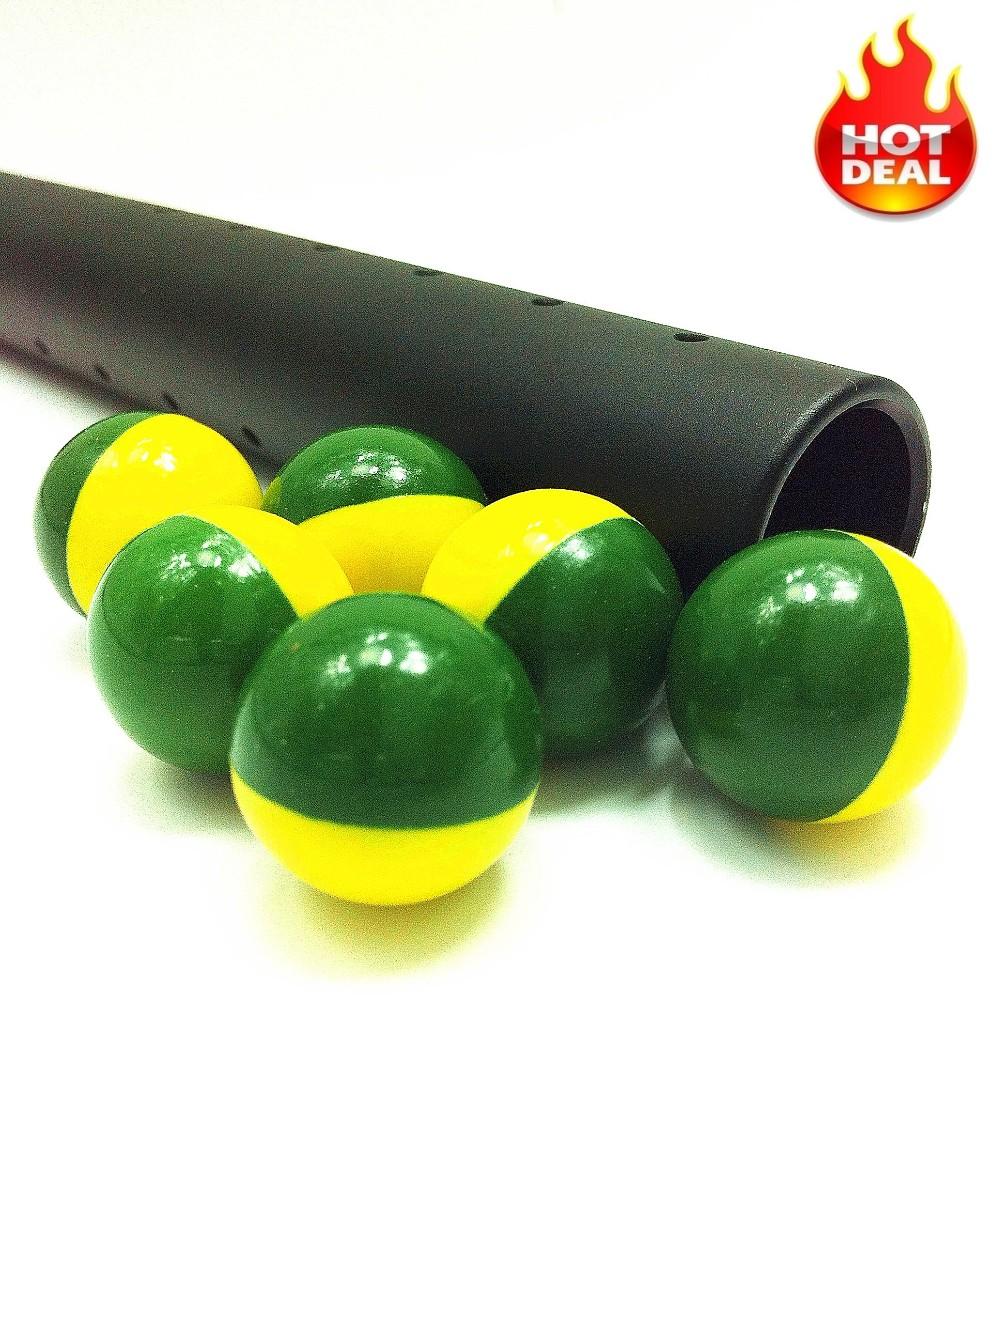 Megio Intermedium Grade Paintball Solid Green Yellow Shell.jpg